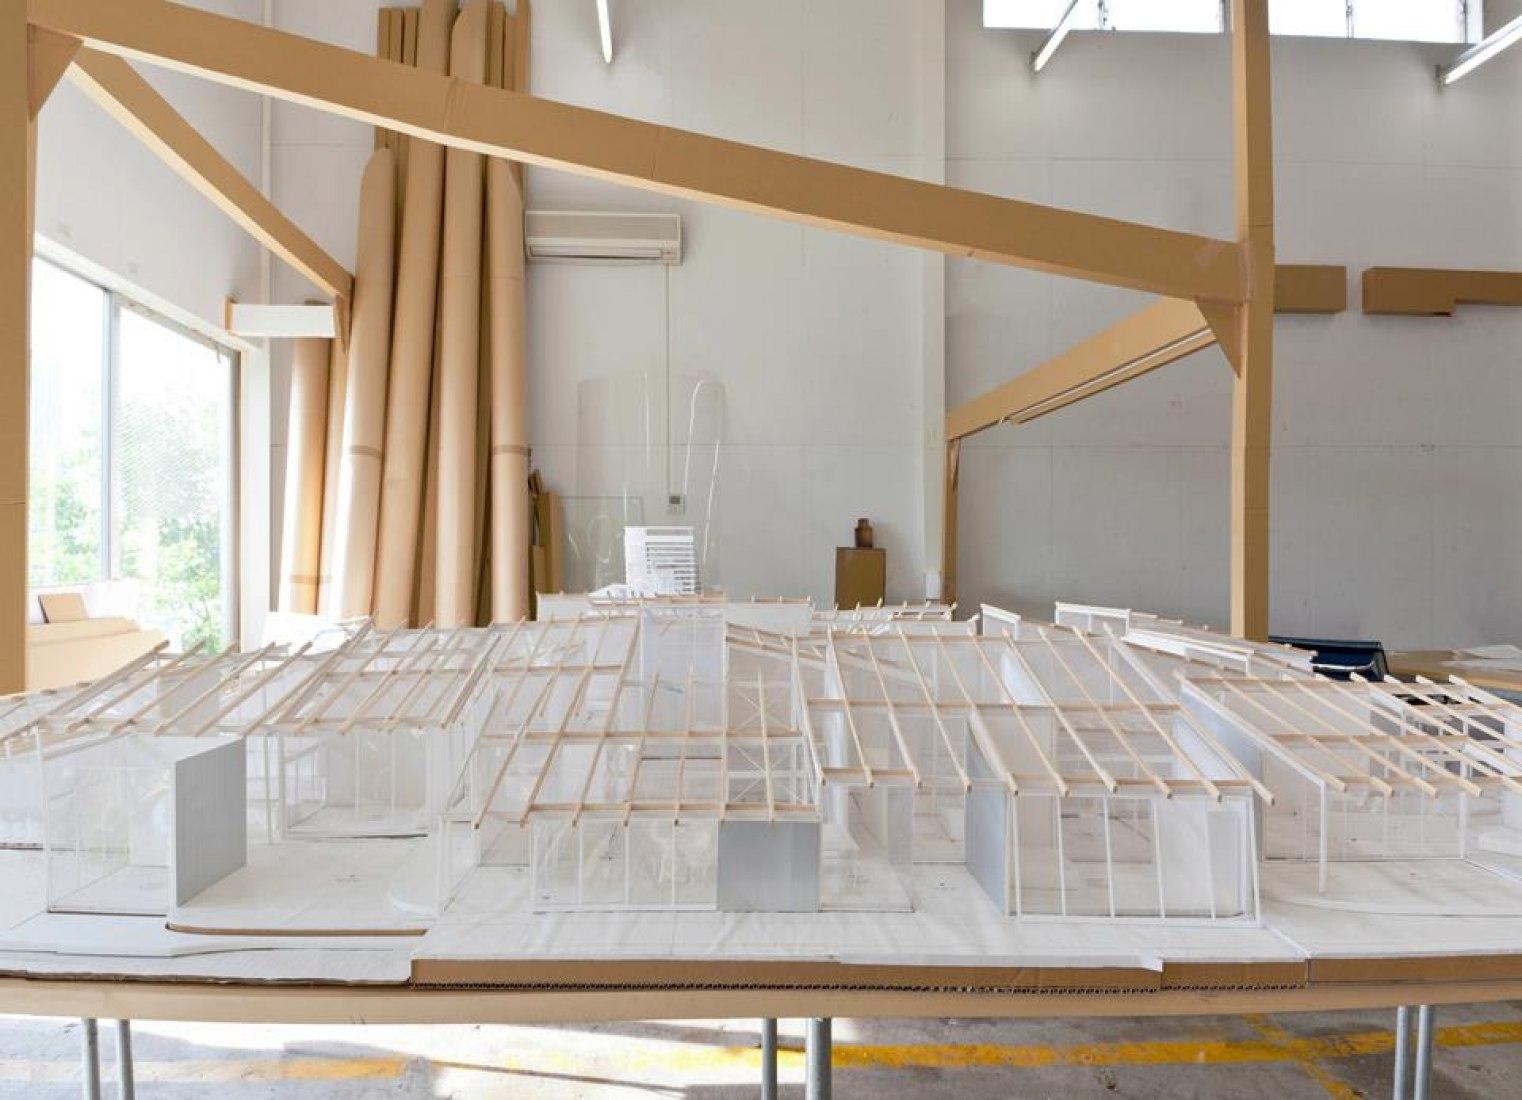 Nishinoyama House By Kazuyo Sejima The Strength Of Architecture From 1998